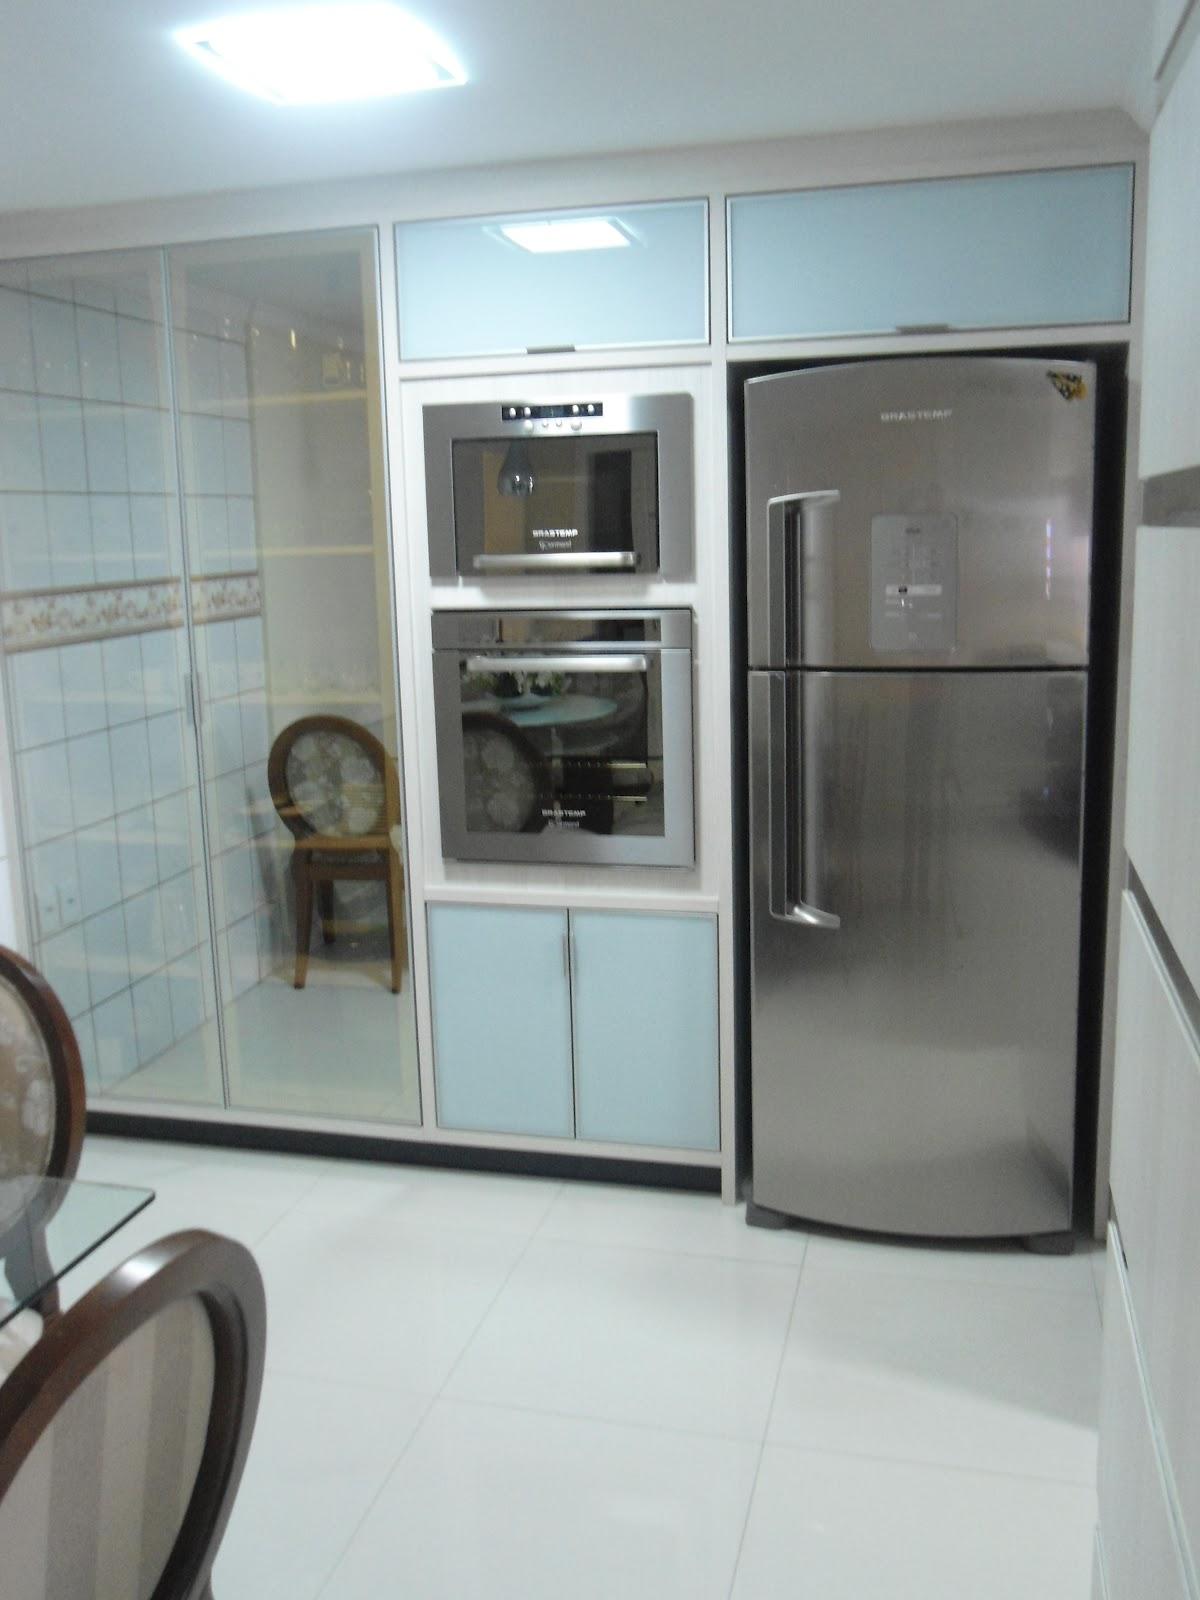 decorativos que dava para sala de estar pratica funcional e clean #5A5041 1200x1600